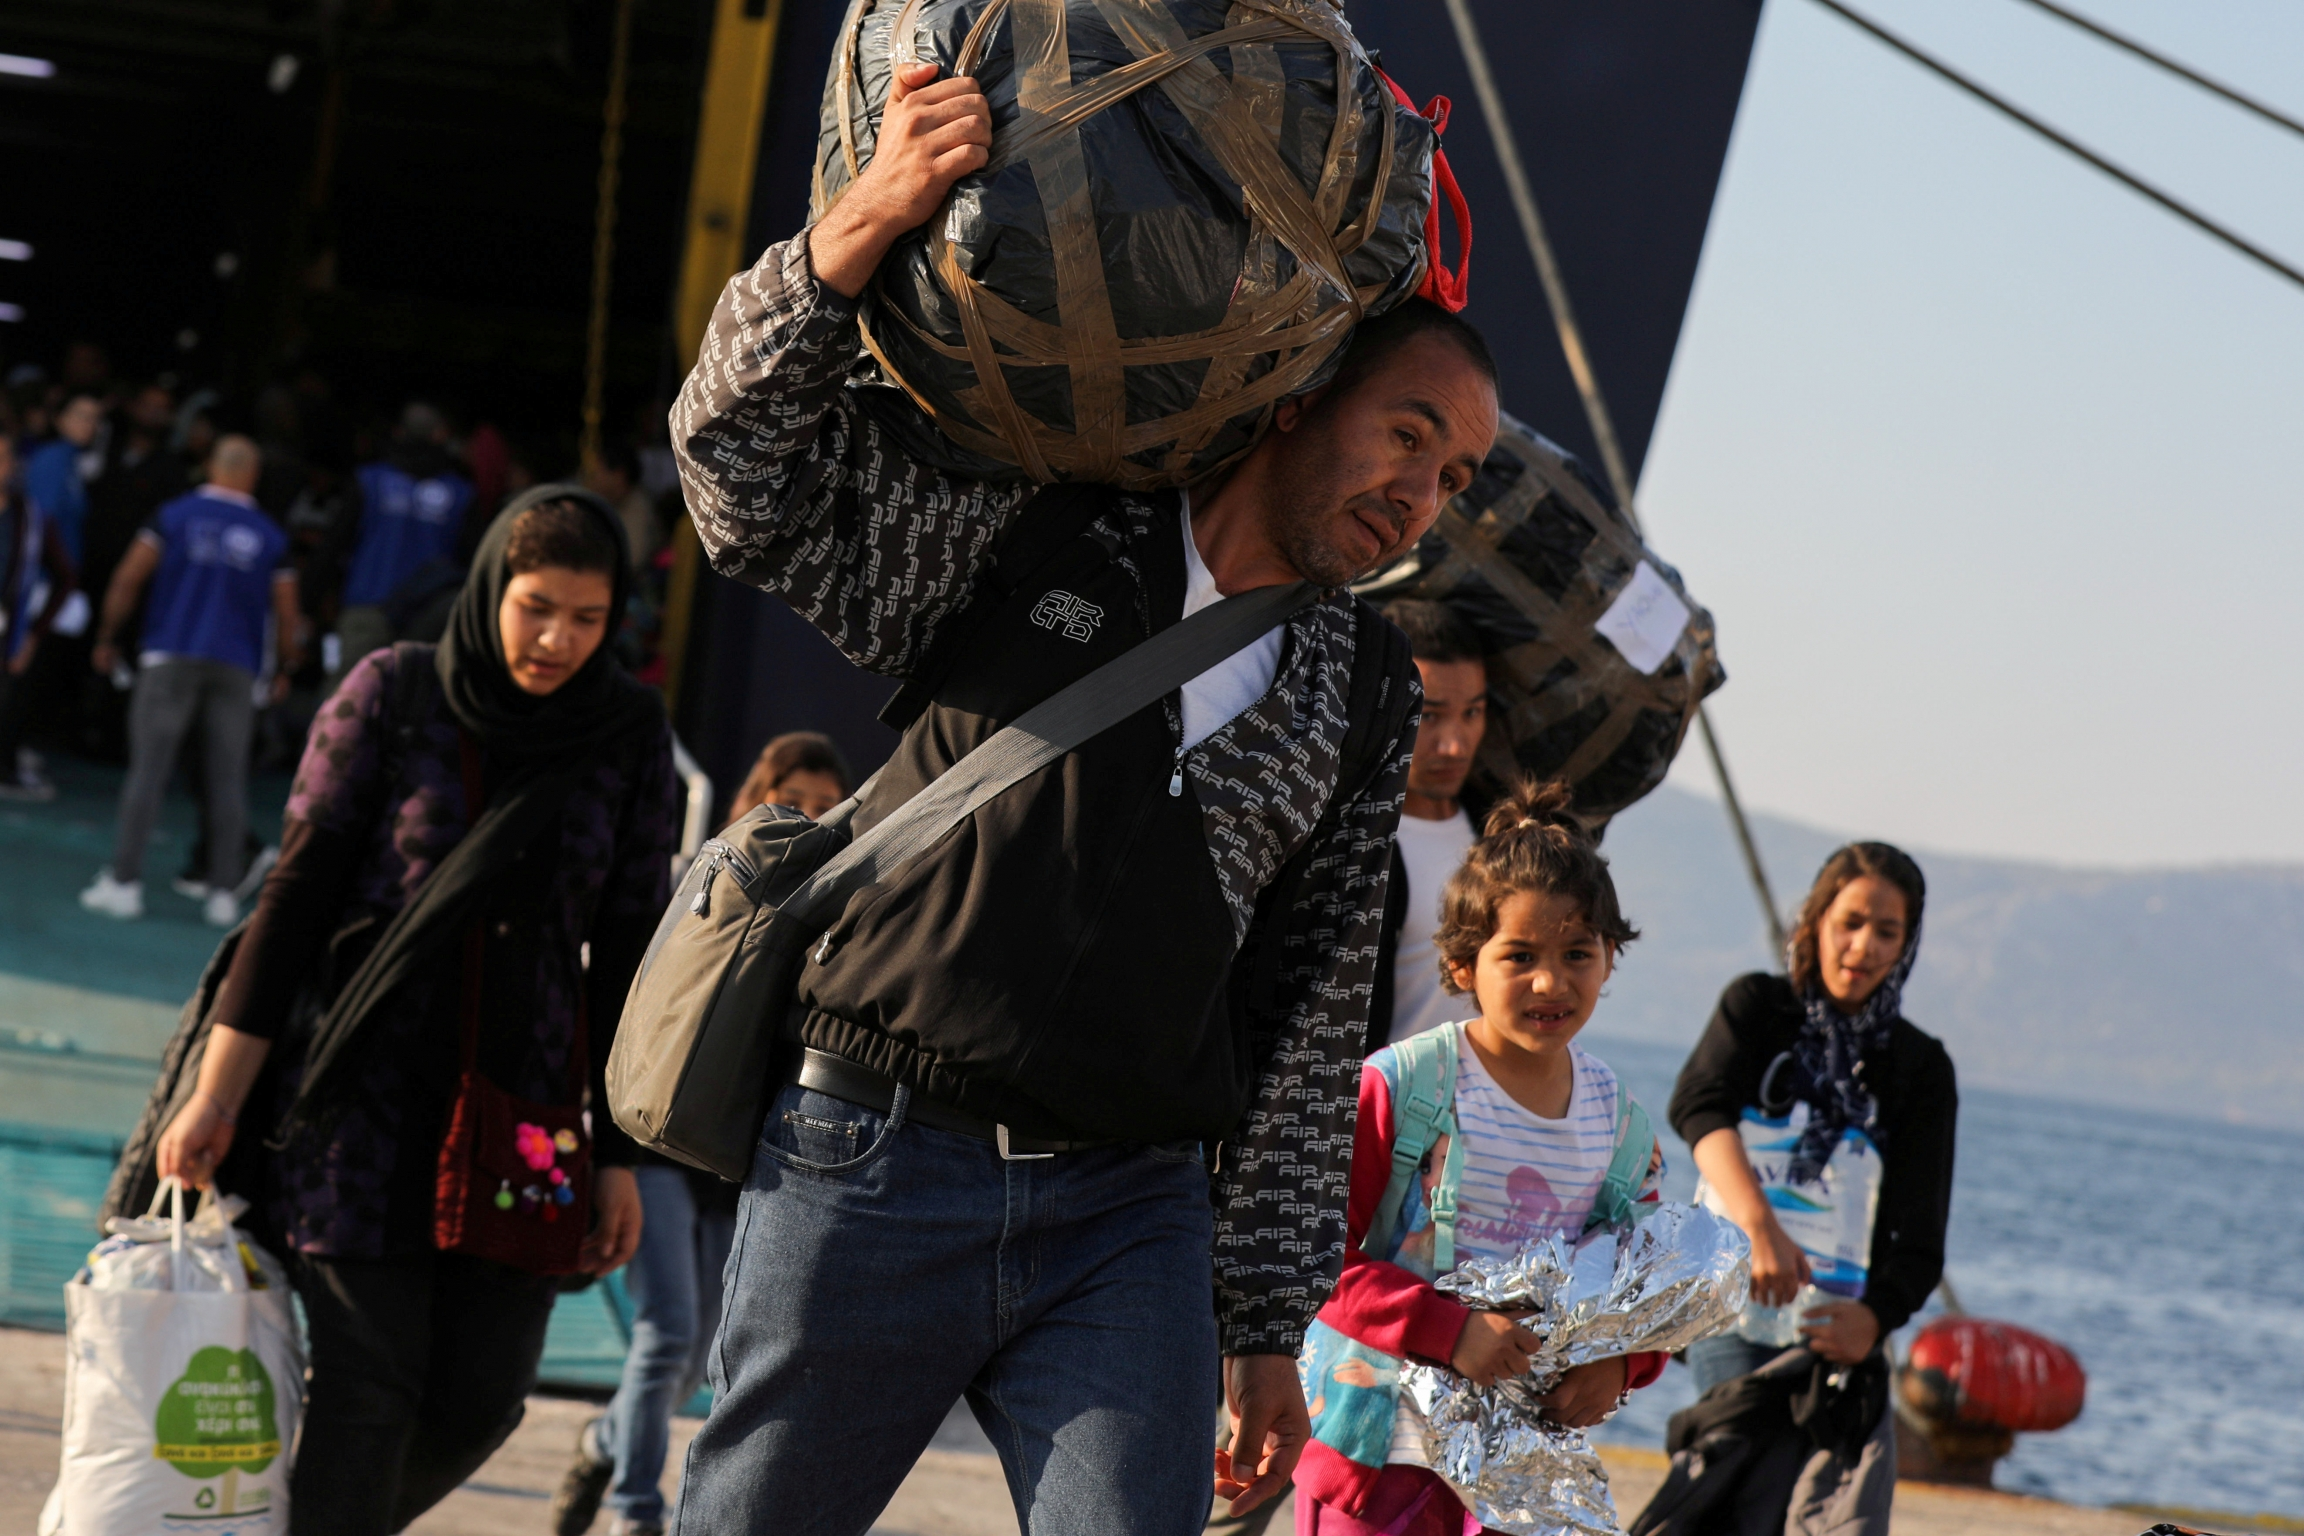 Refugeesand migrants arrive aboard the Paros Jet passenger ship at the port of Elefsina near Athens,Greece, Oct. 22, 2019.